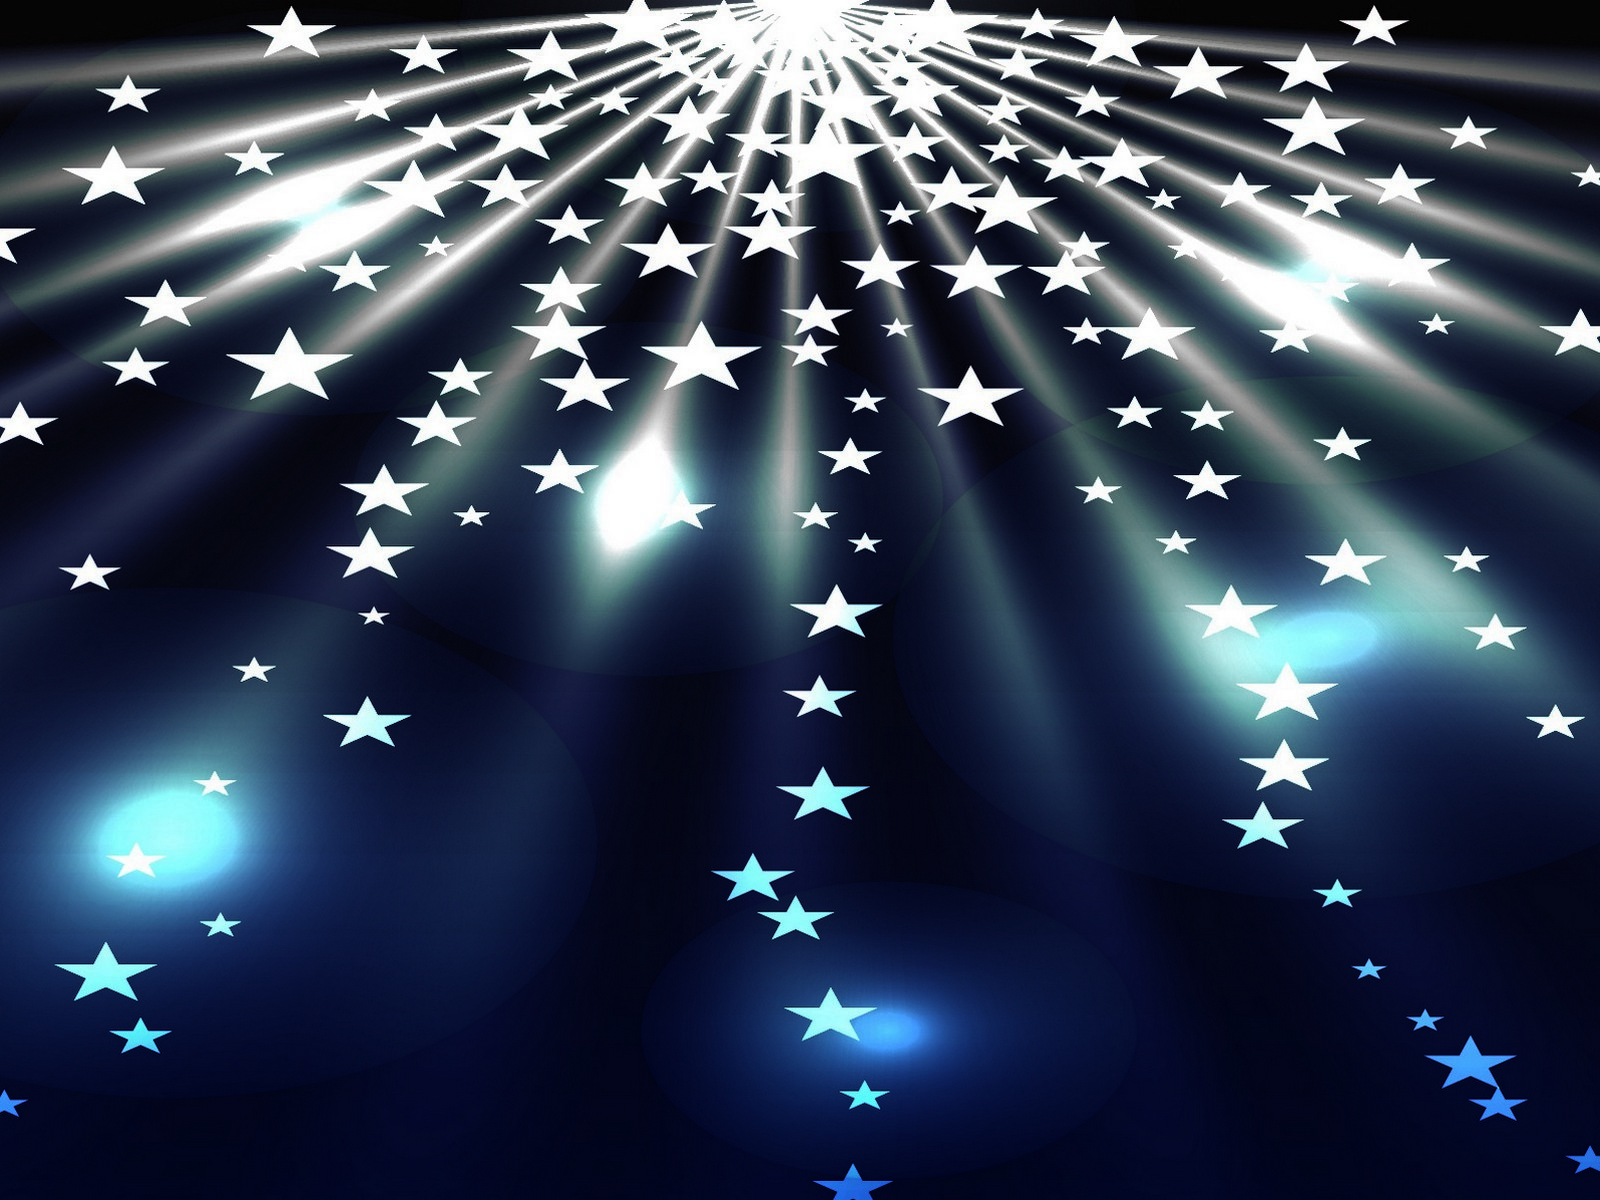 White Stars PPT Backgrounds